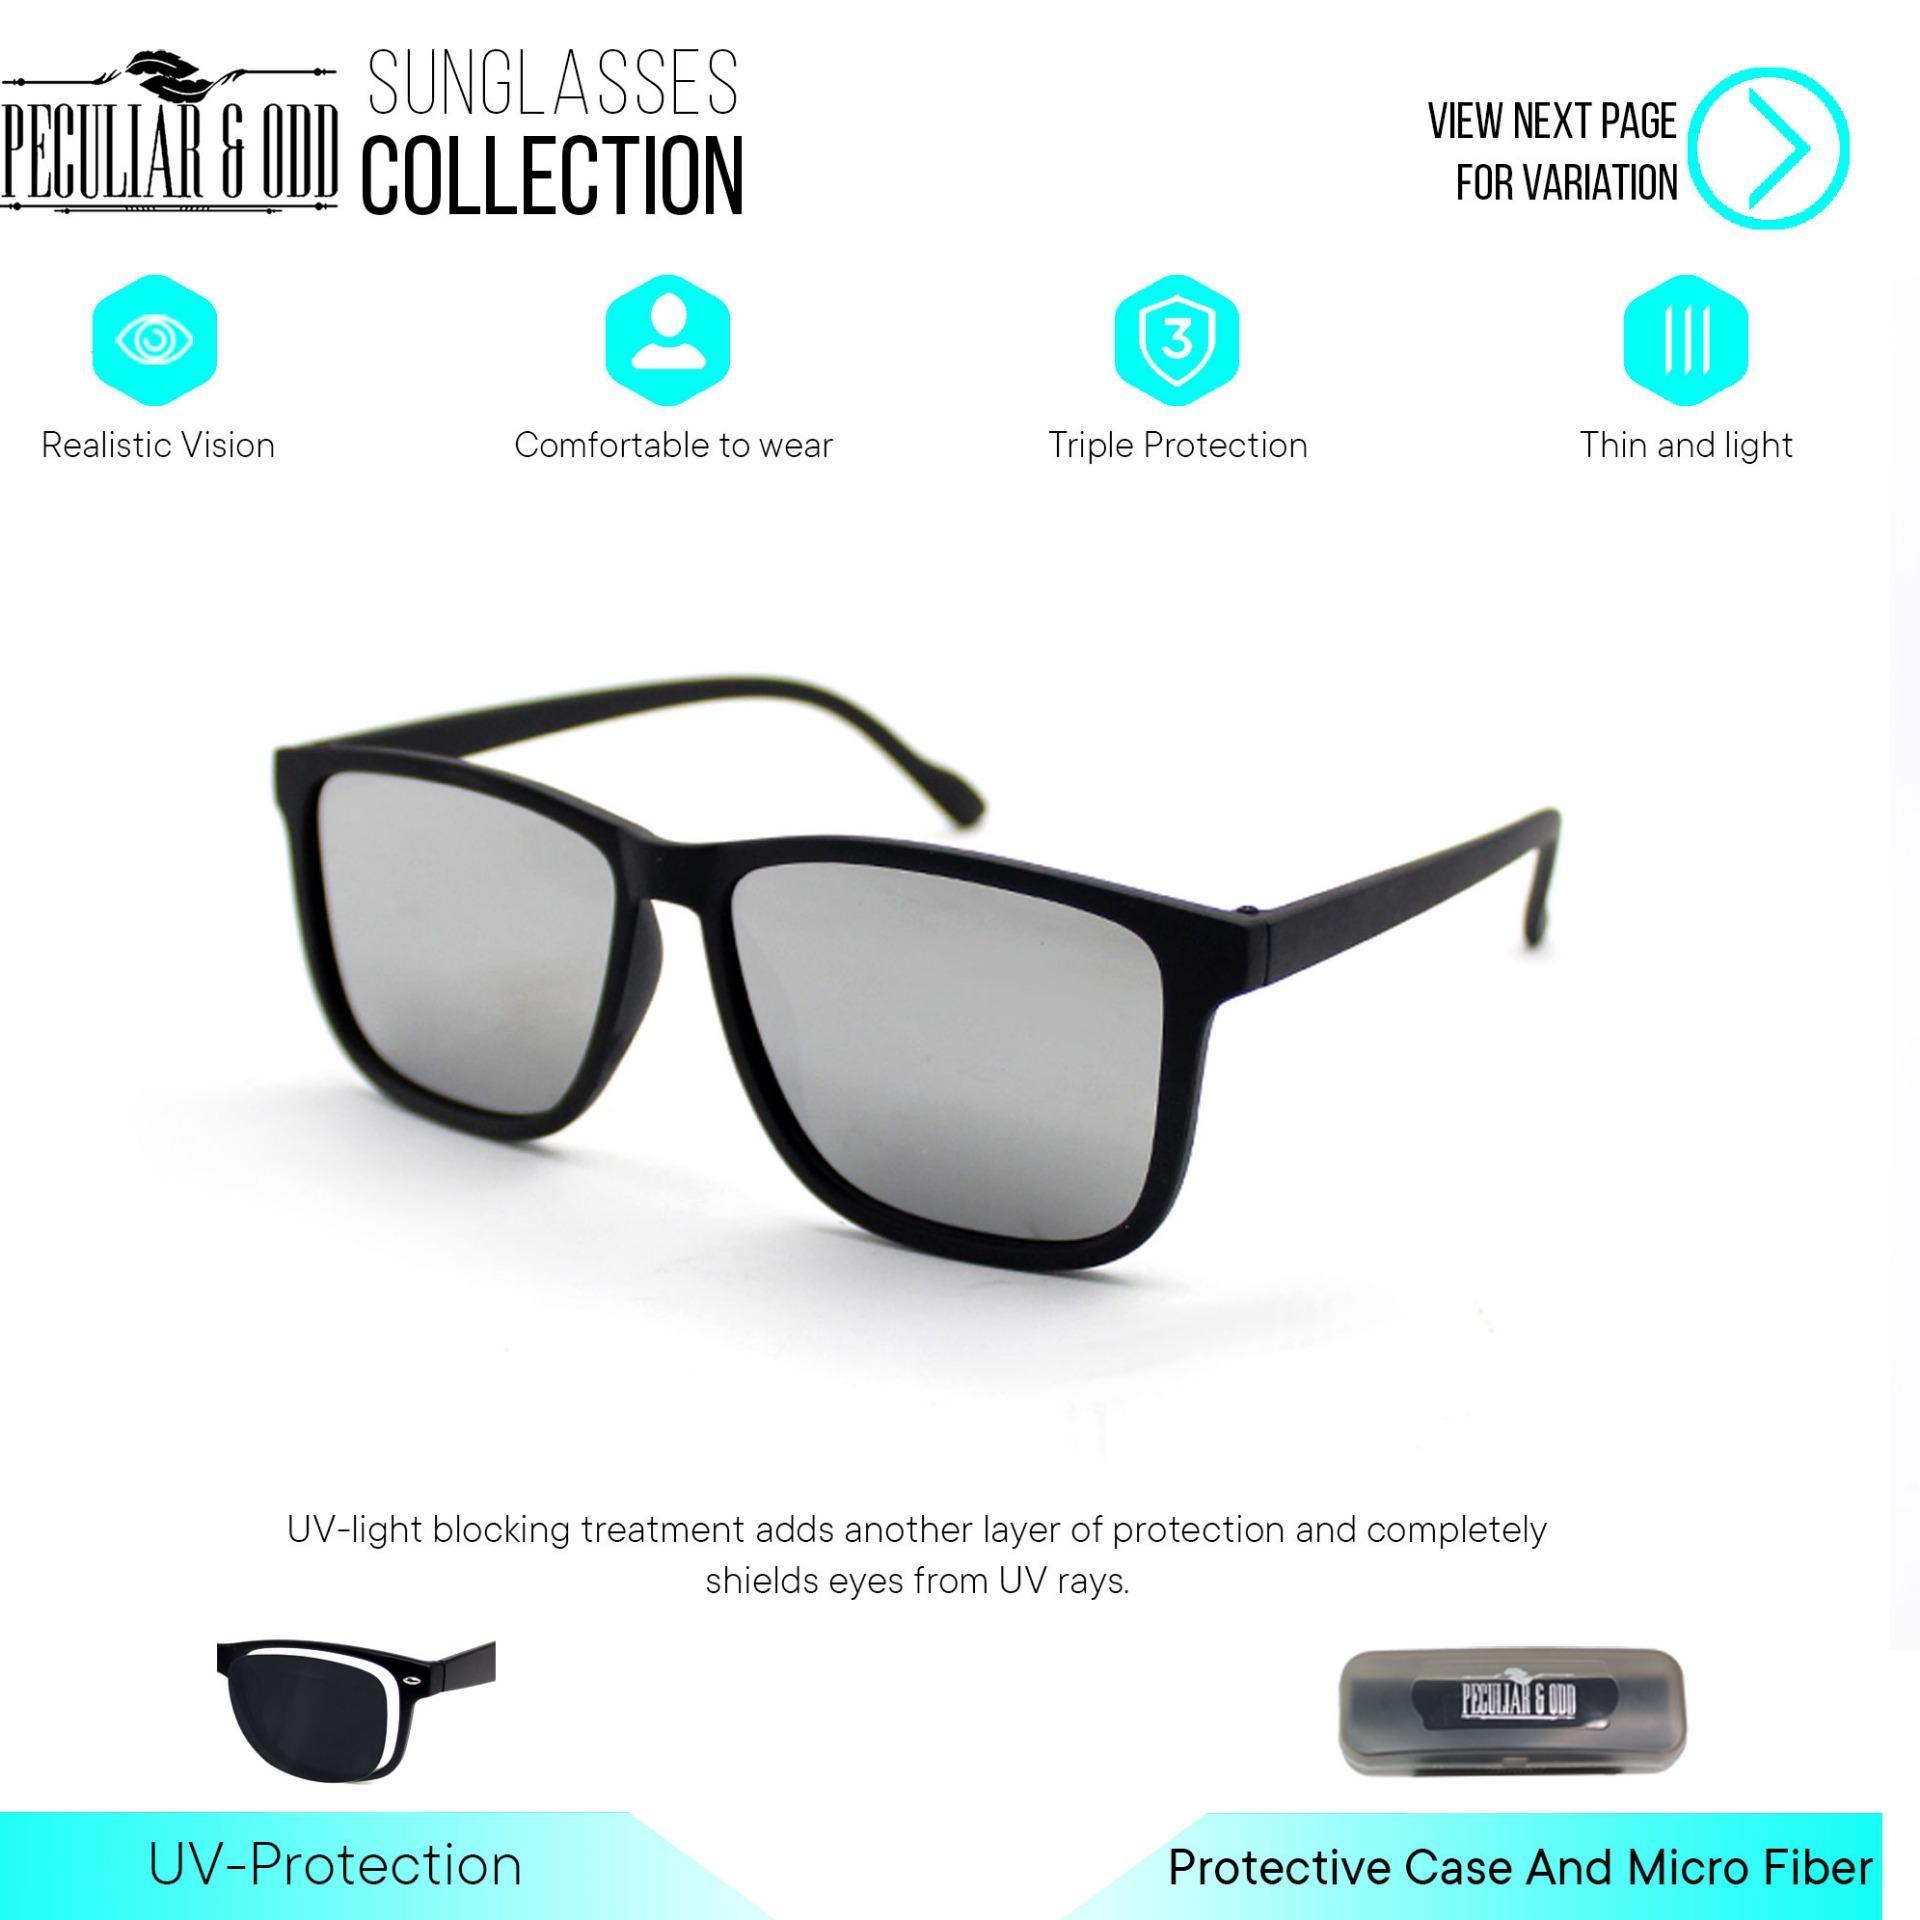 60a15312d3c6 Sunglasses For Men for sale - Mens Sunglasses Online Deals & Prices in  Philippines | Lazada.com.ph